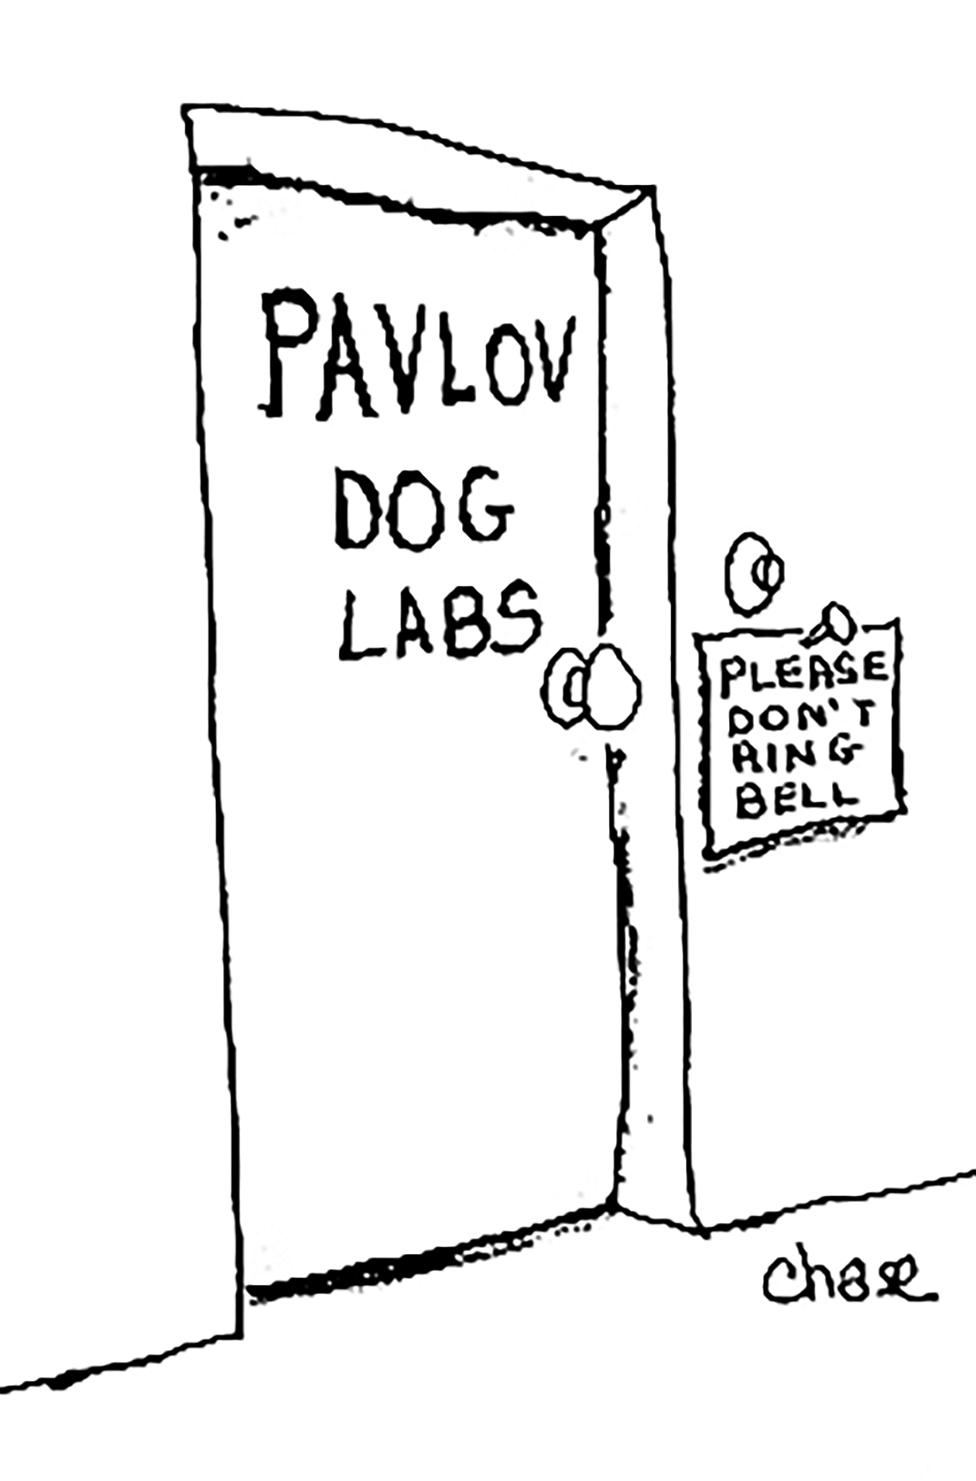 Pavlov Dog Labs